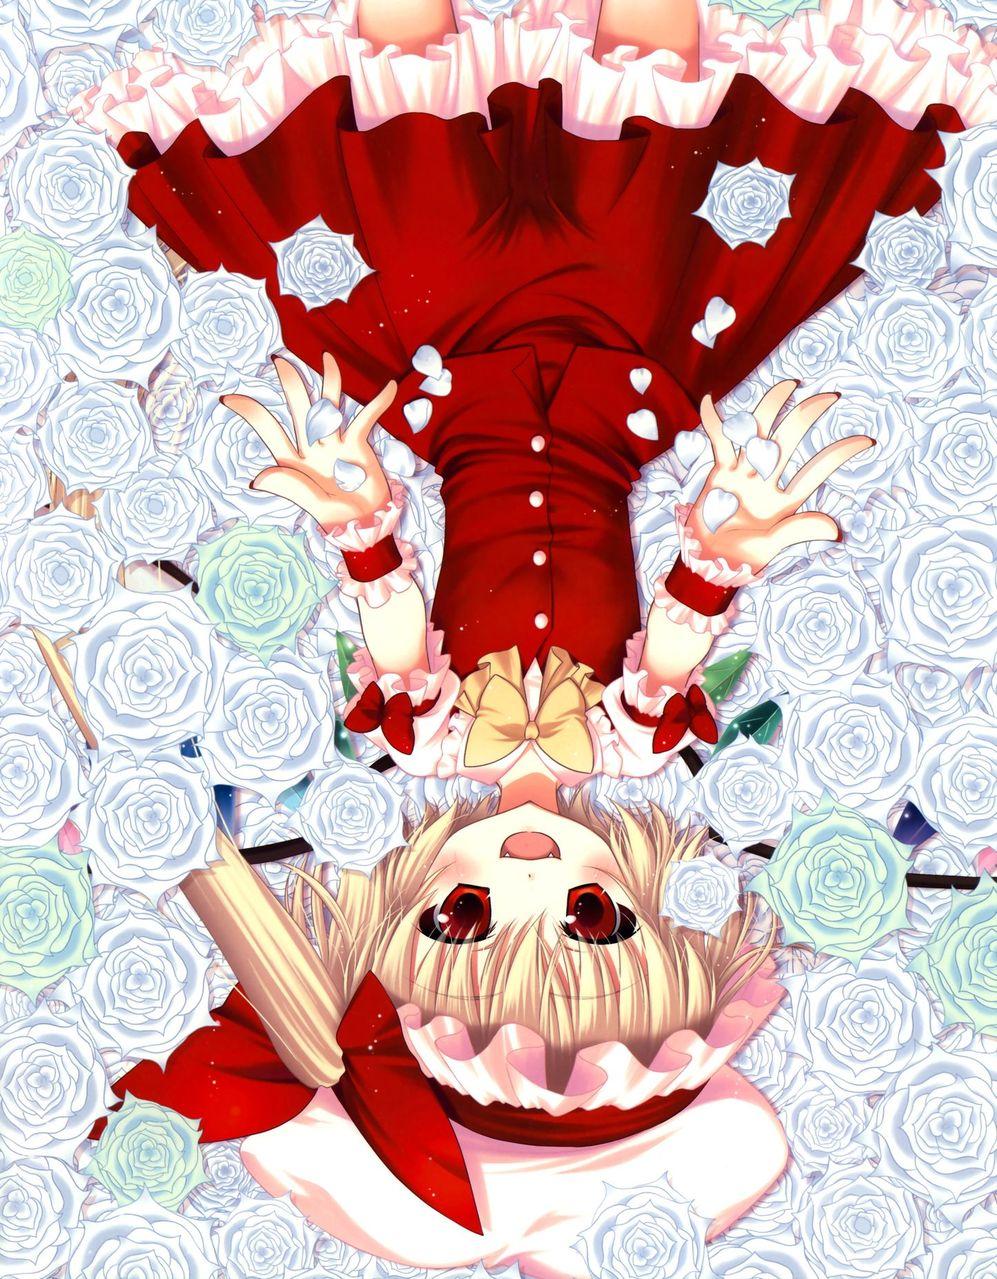 <font color=red>奥雅人偶</font>和蔷薇少女人偶大比对_百田圈圈_百